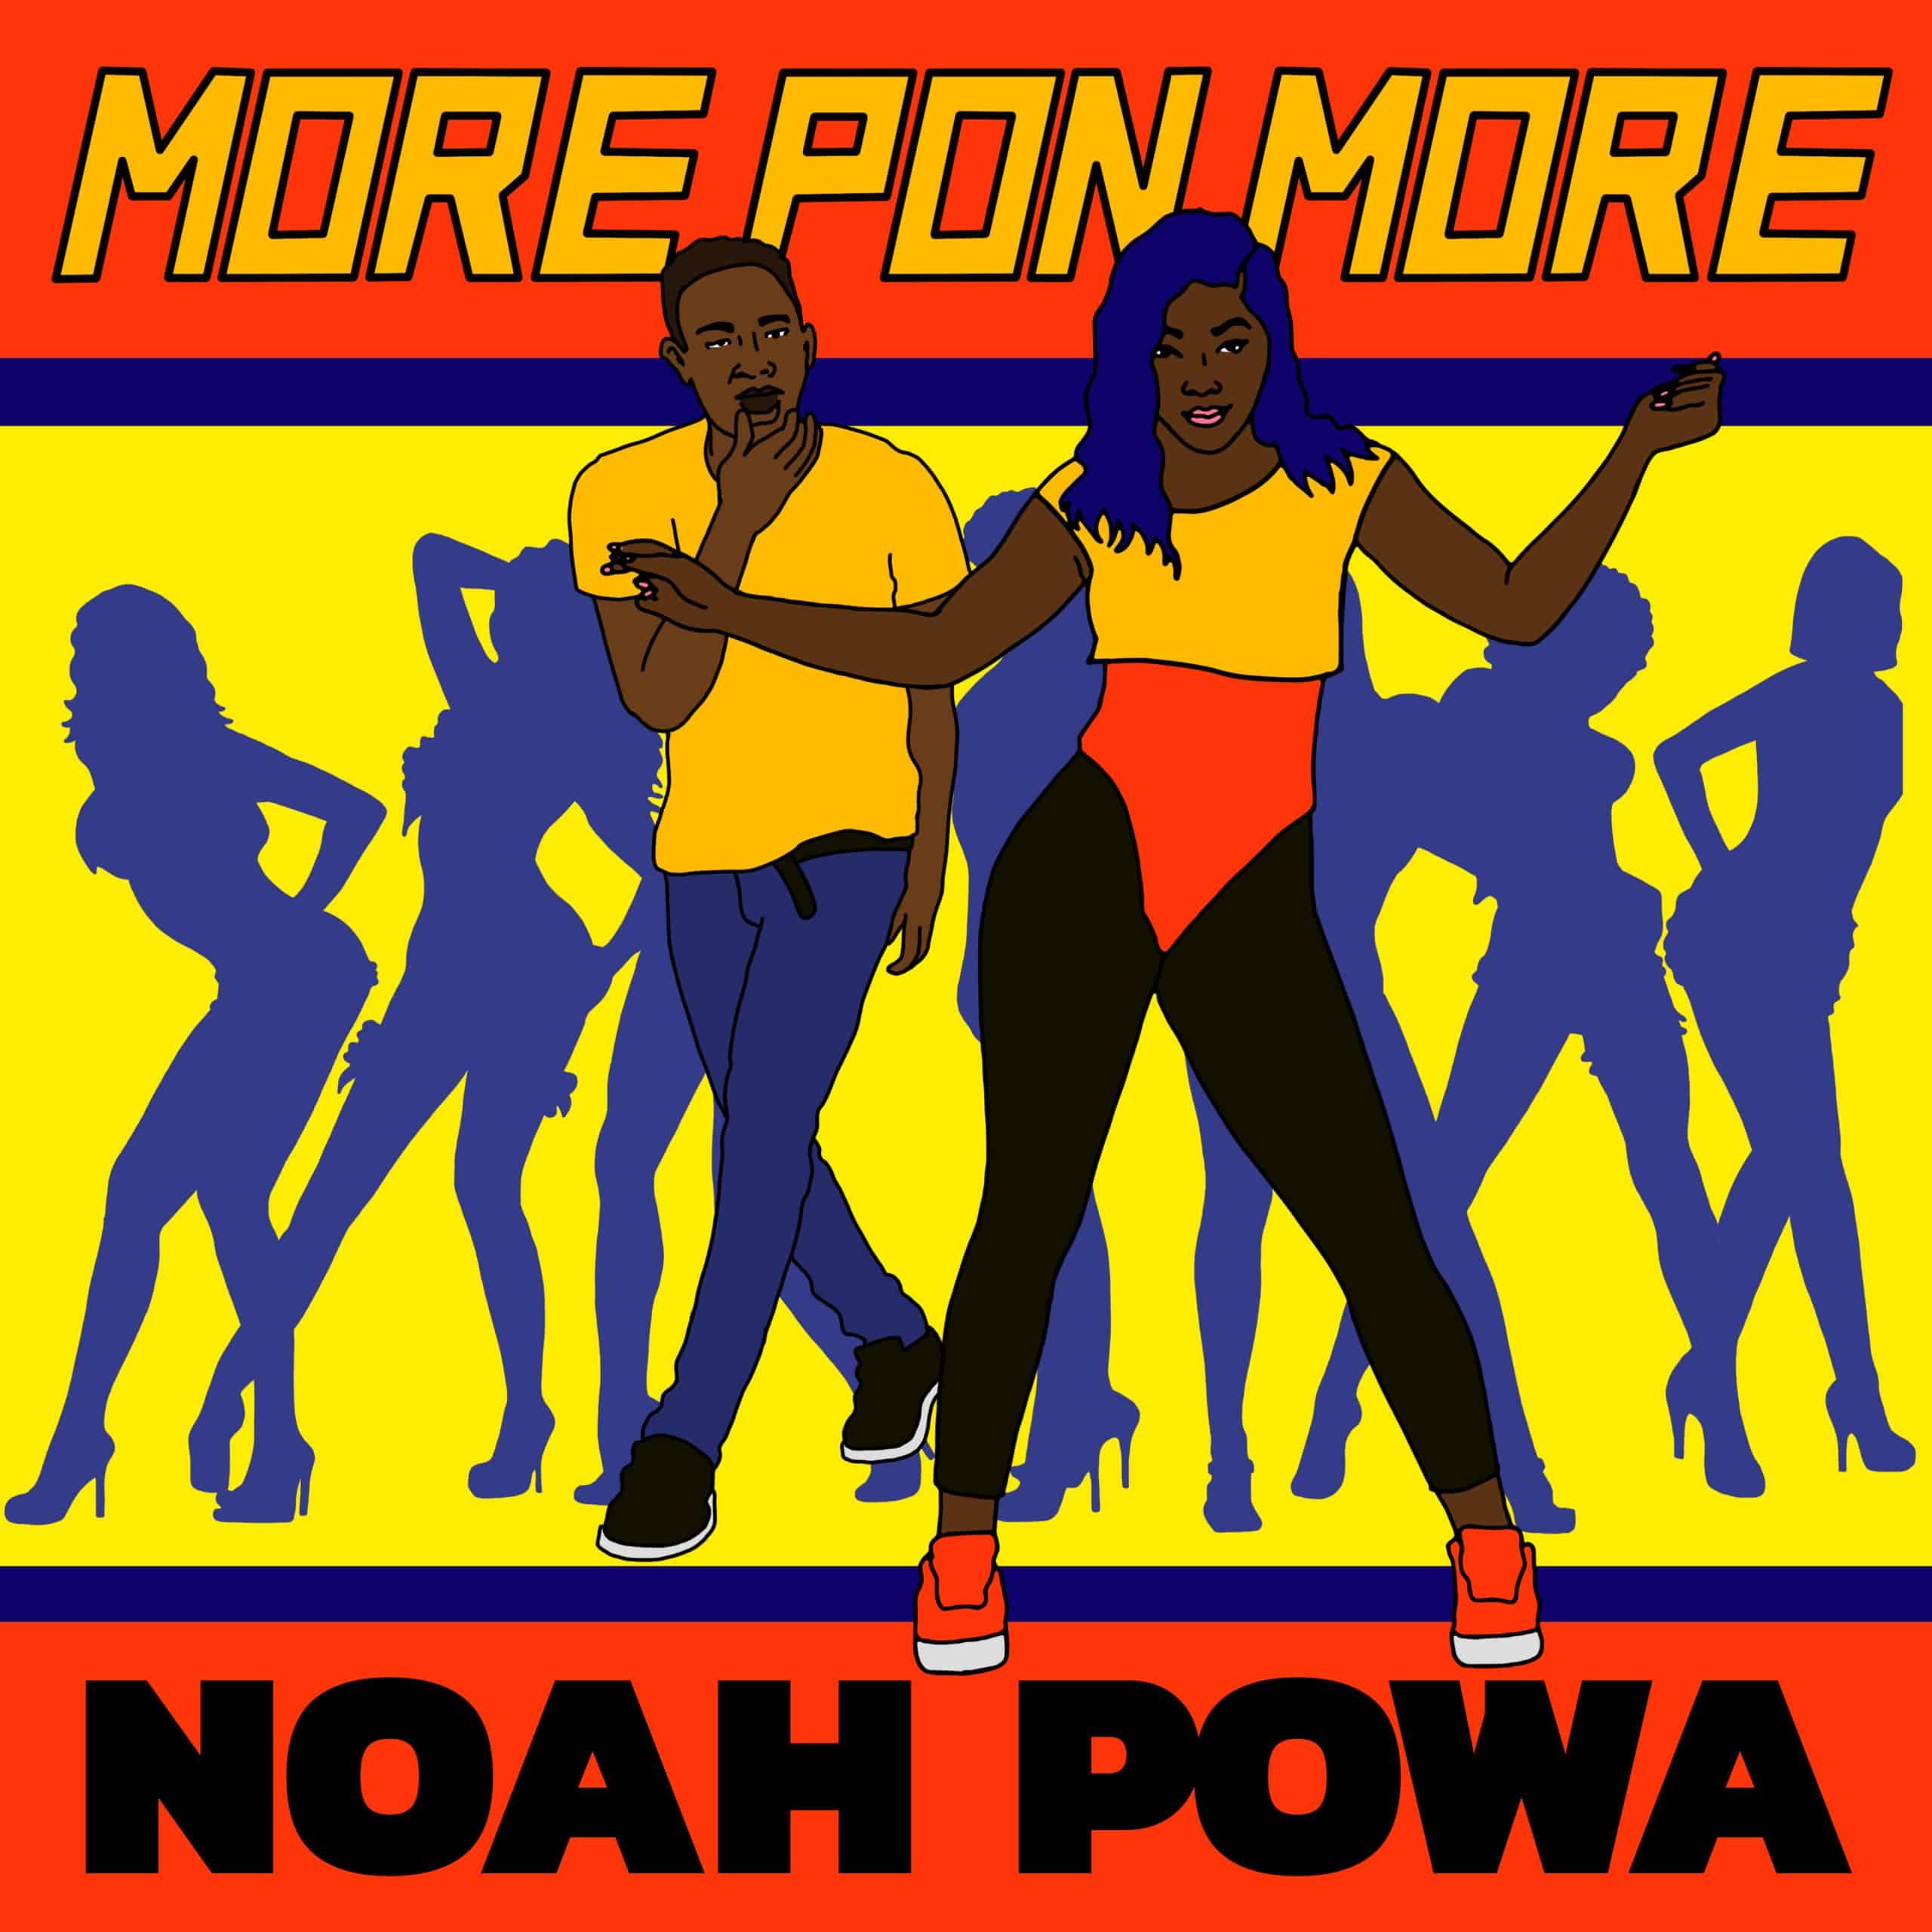 Noah Powa - More Pon More